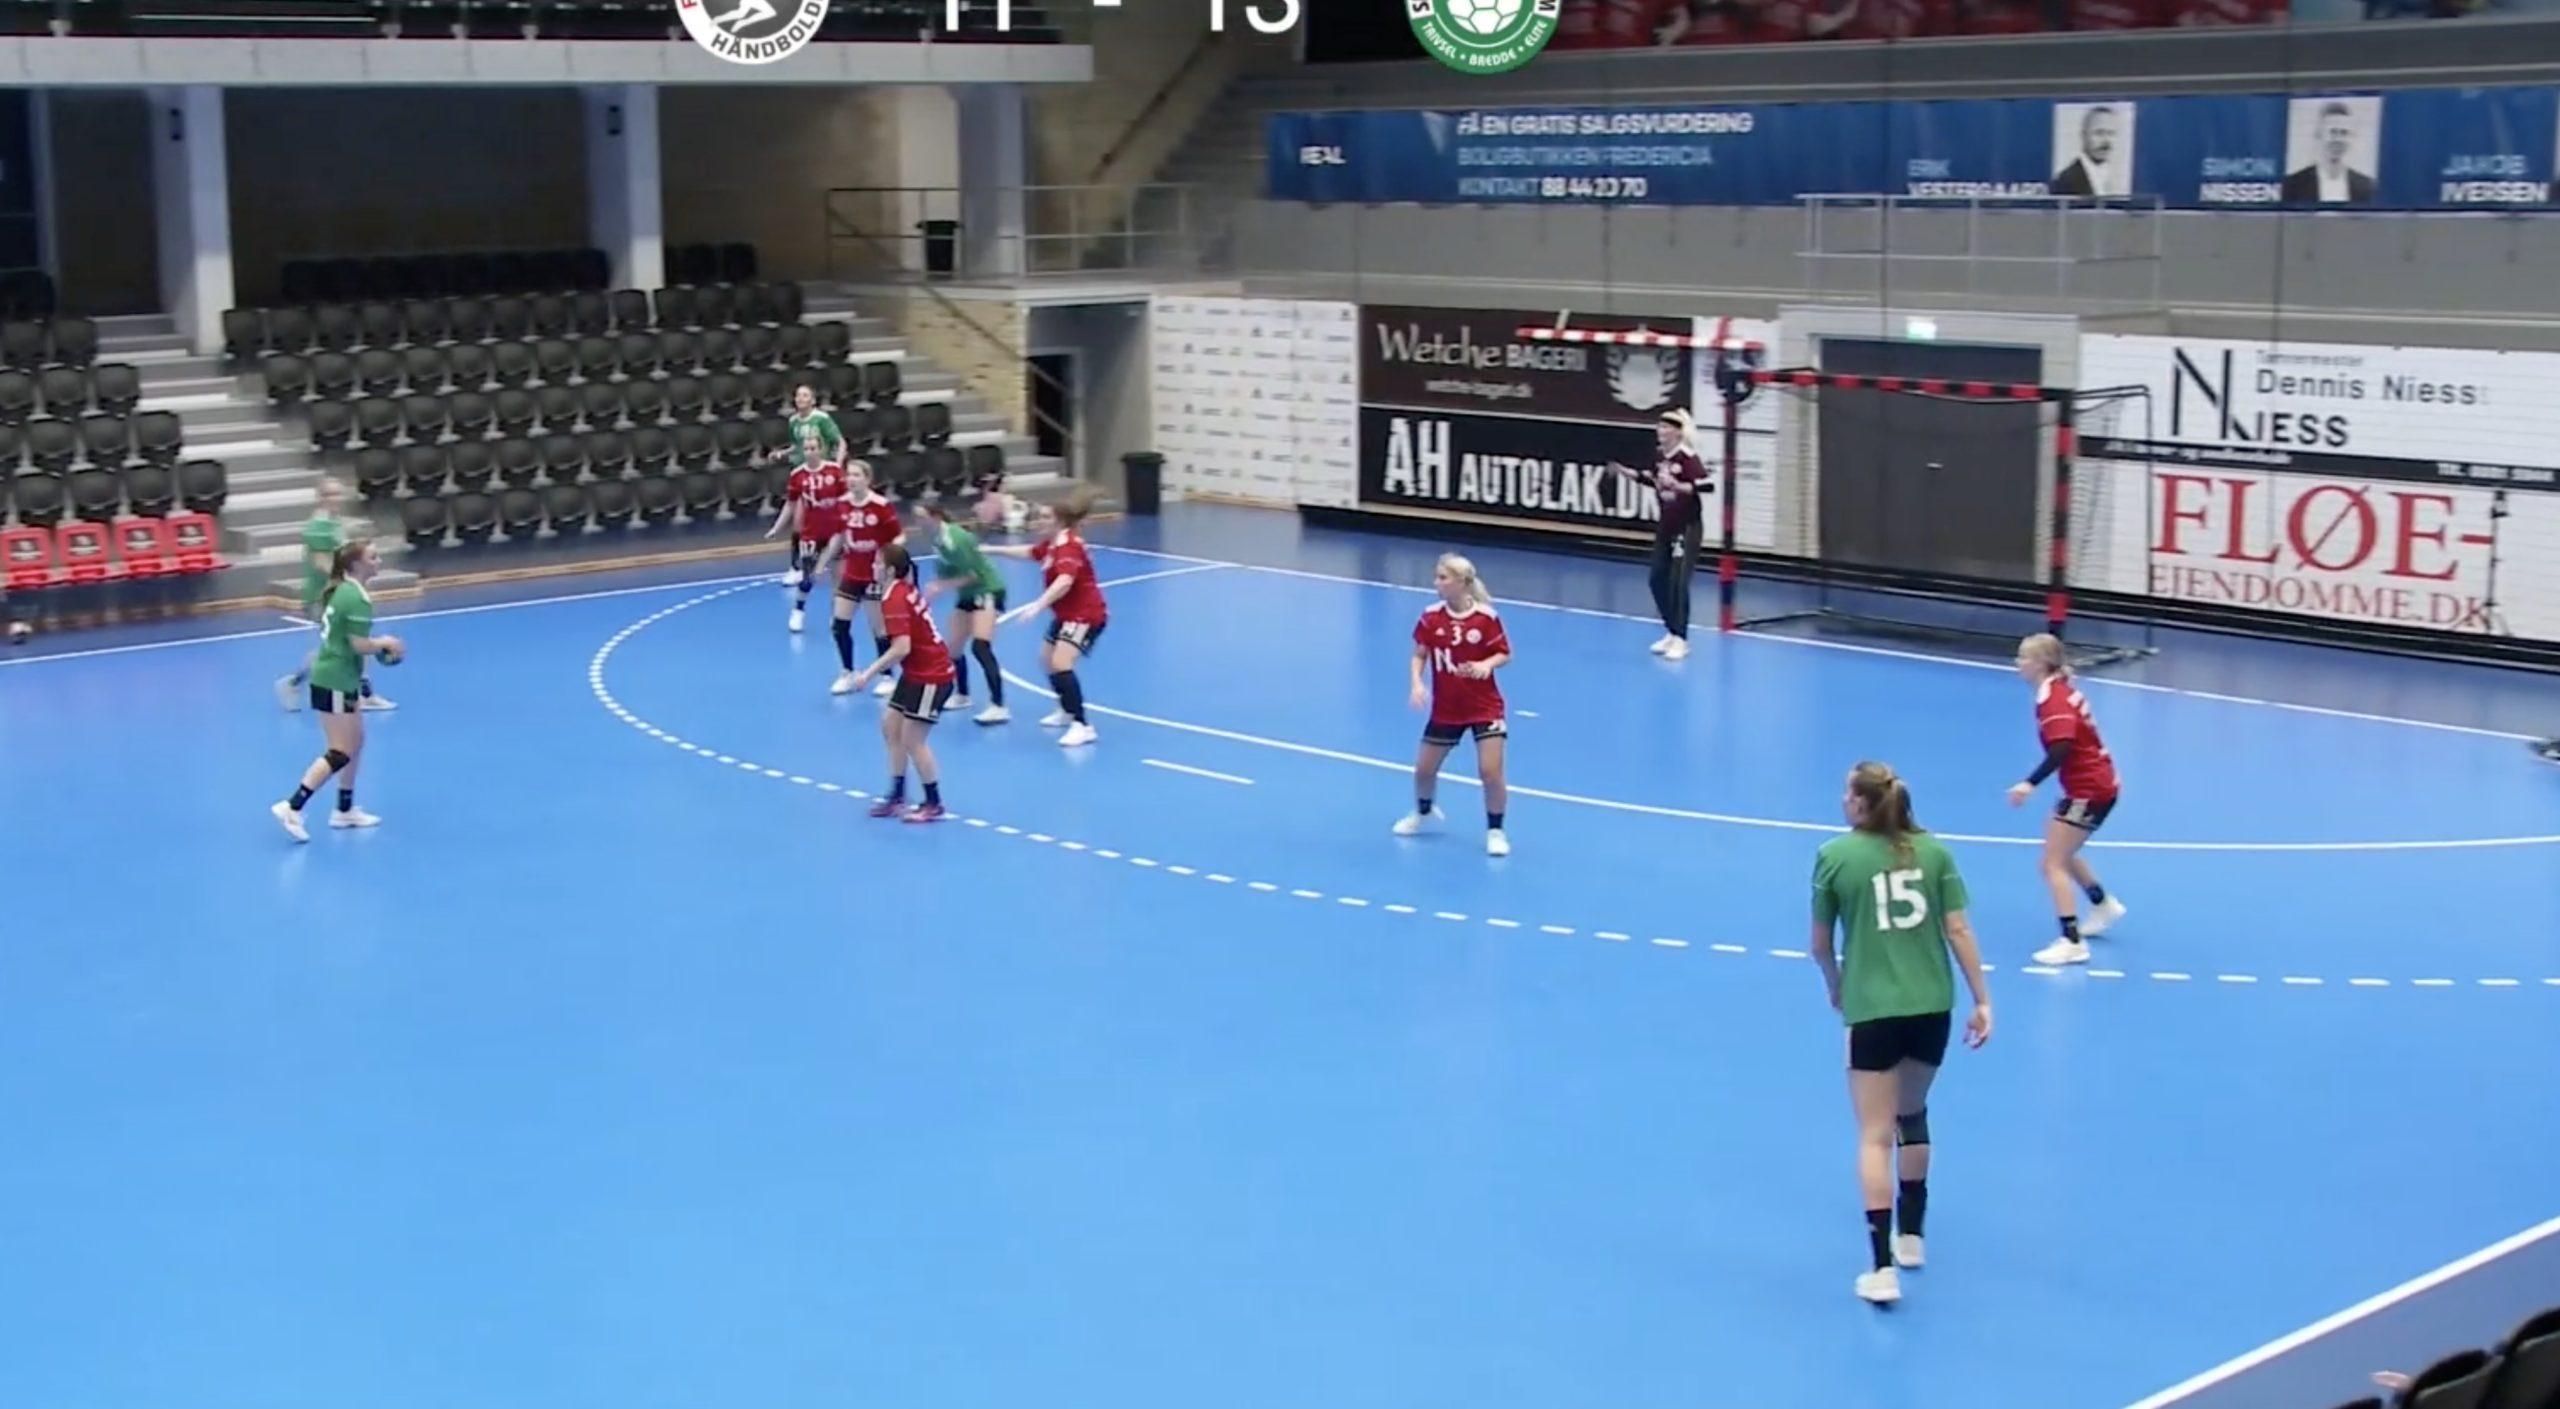 Se håndboldkamp: FHK damer V.s. Silkeborg Voel